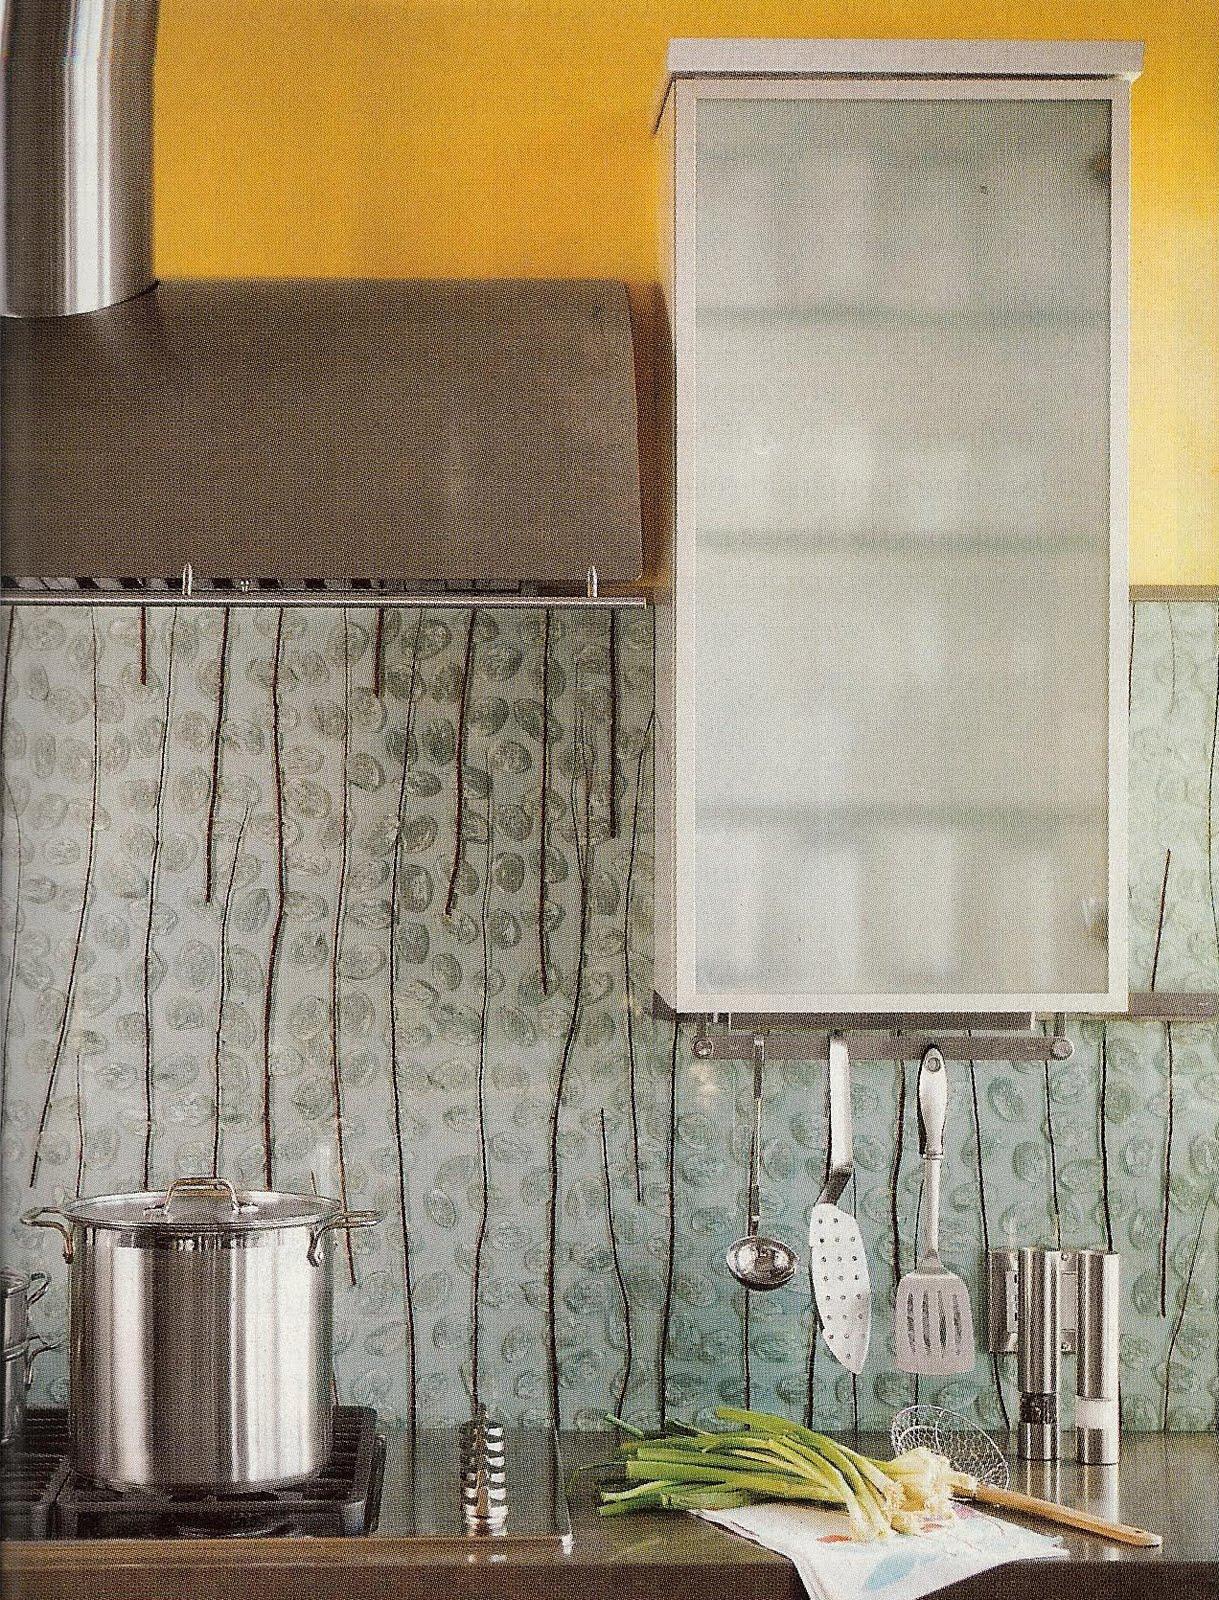 http://3.bp.blogspot.com/_QMRoN9dwyEs/TBvTXqwPzdI/AAAAAAAAAhE/k0z0rABUtEs/s1600/kitchenandbathideas-design-barbara-enberg-photo-ed-gohlich.jpg